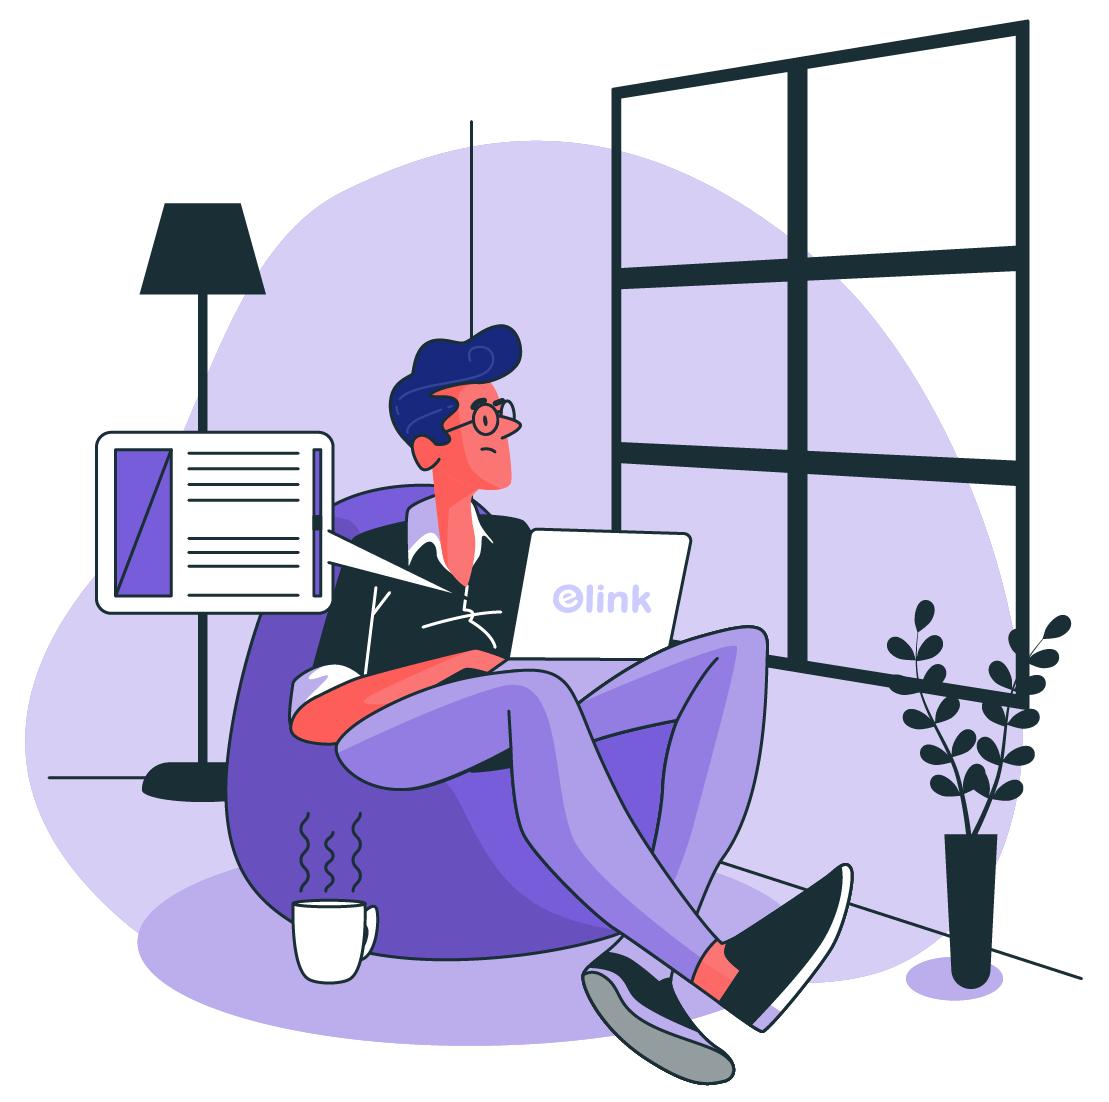 Blogging as a small business idea